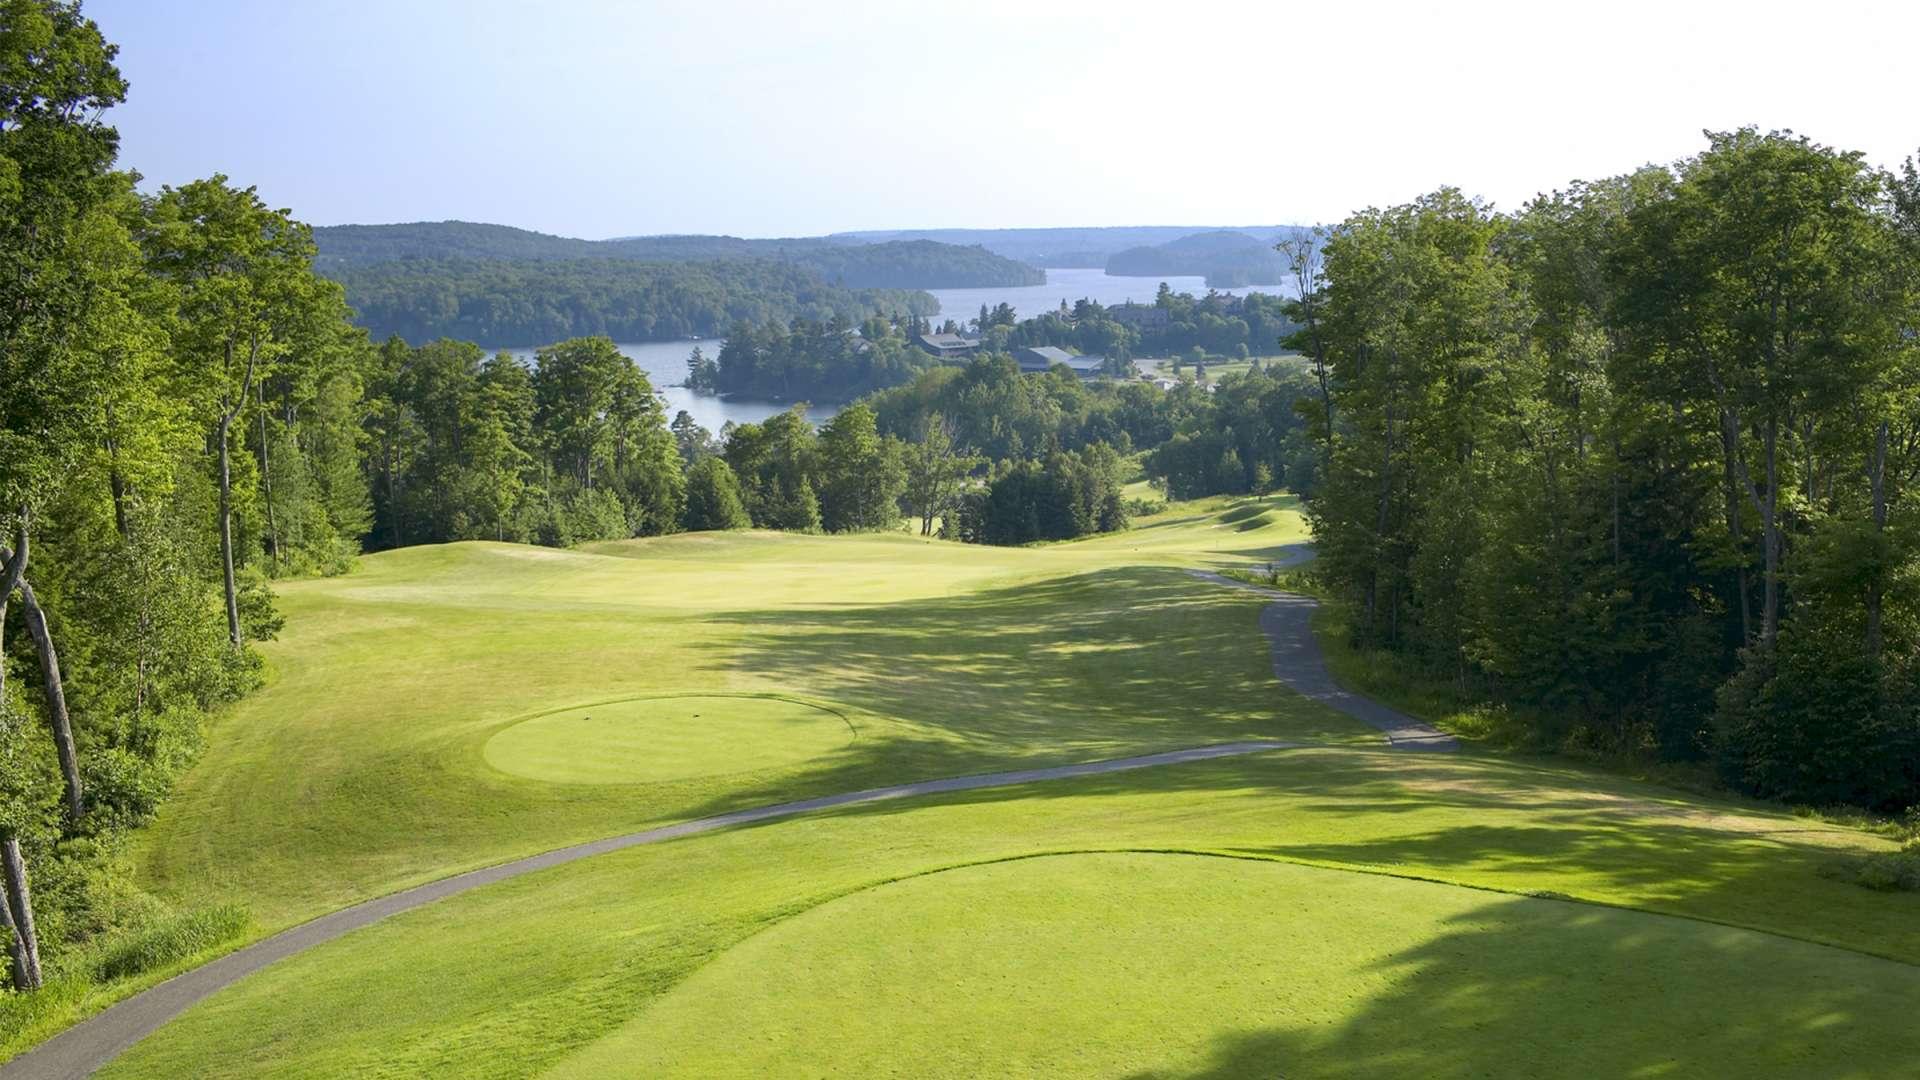 Stay & Play Golf Packages at Deerhurst Resort